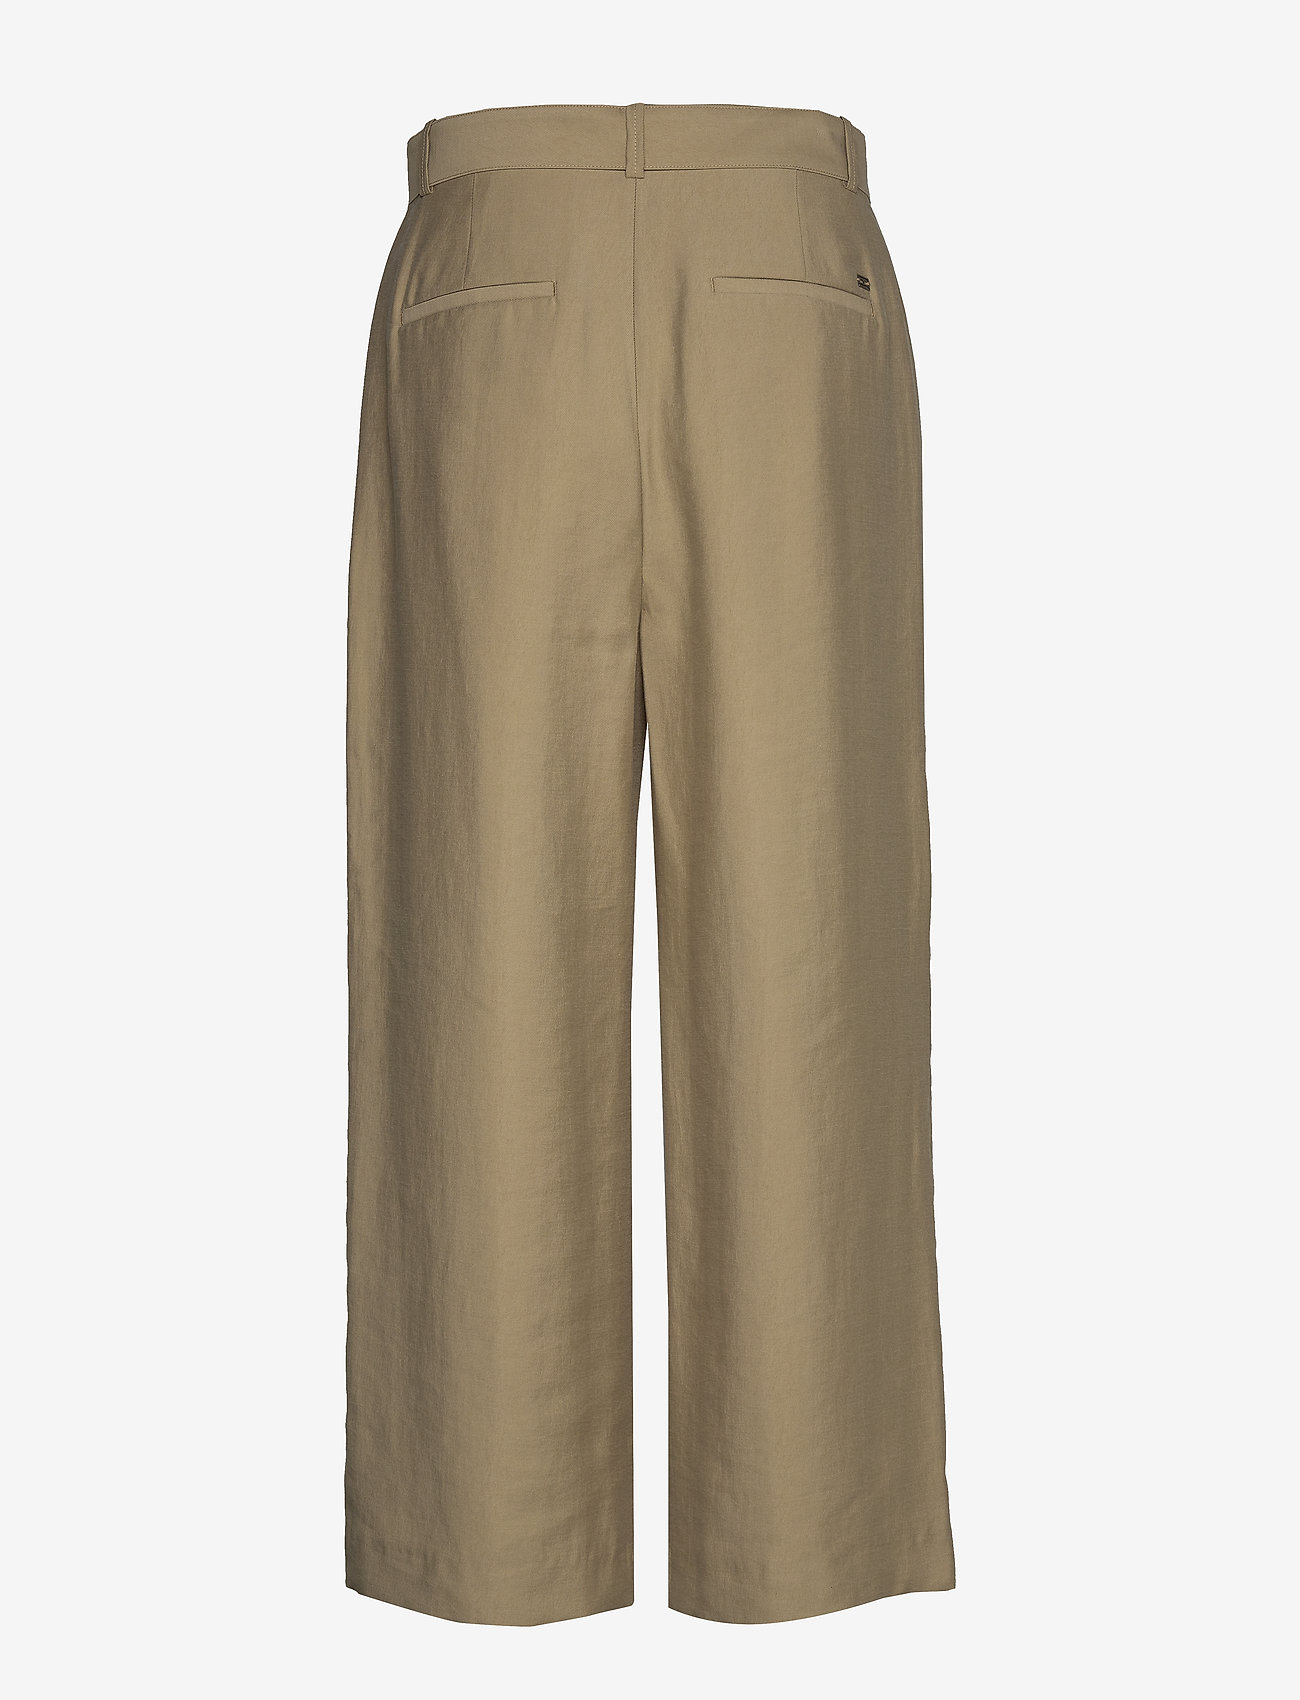 Tommy Hilfiger - TENCEL TWILL WIDE LEG CR PANT - wide leg trousers - surplus khaki - 1